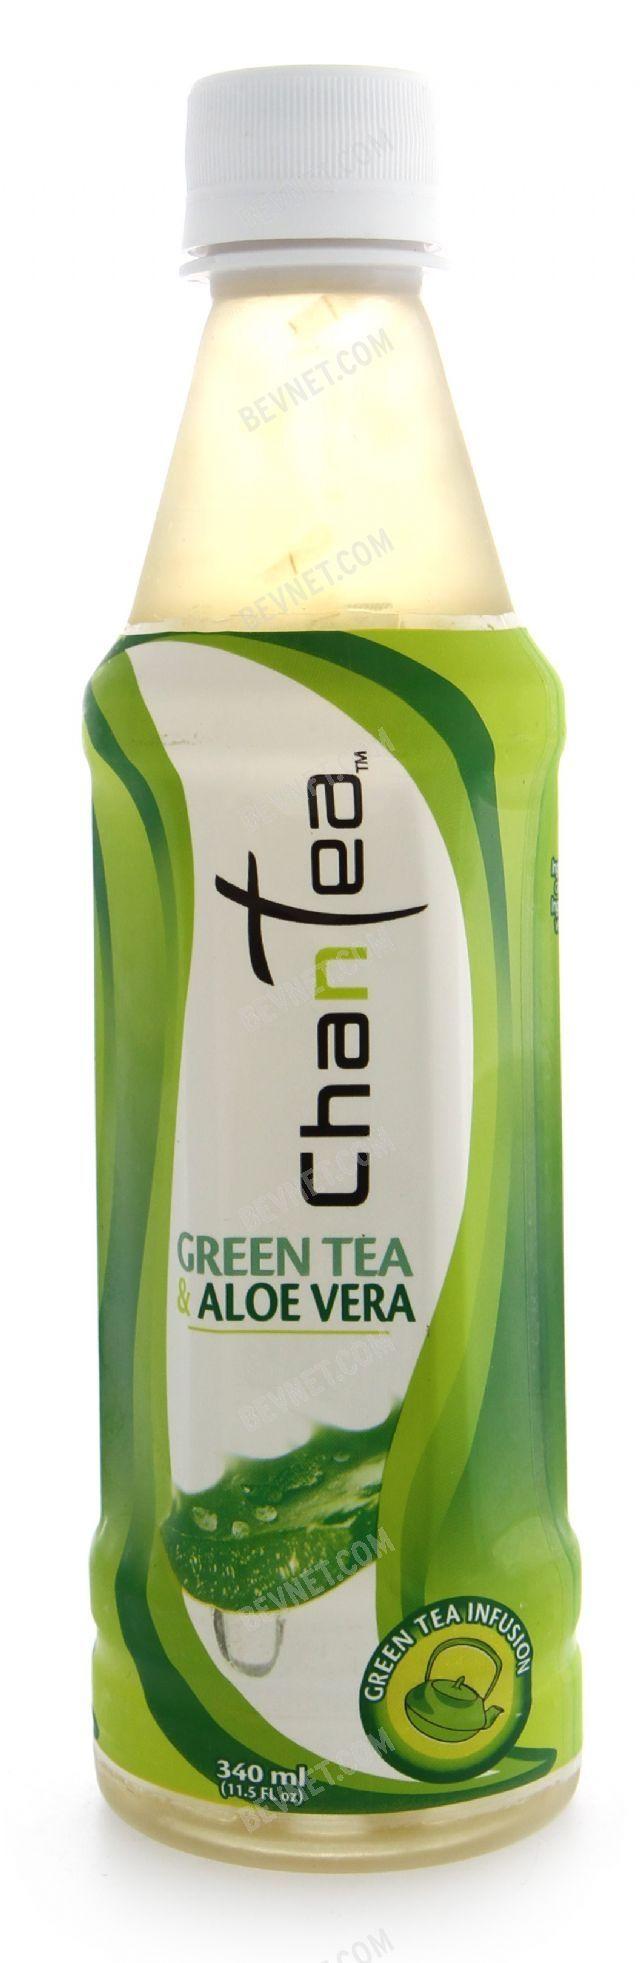 Green Tea Aloe Vera